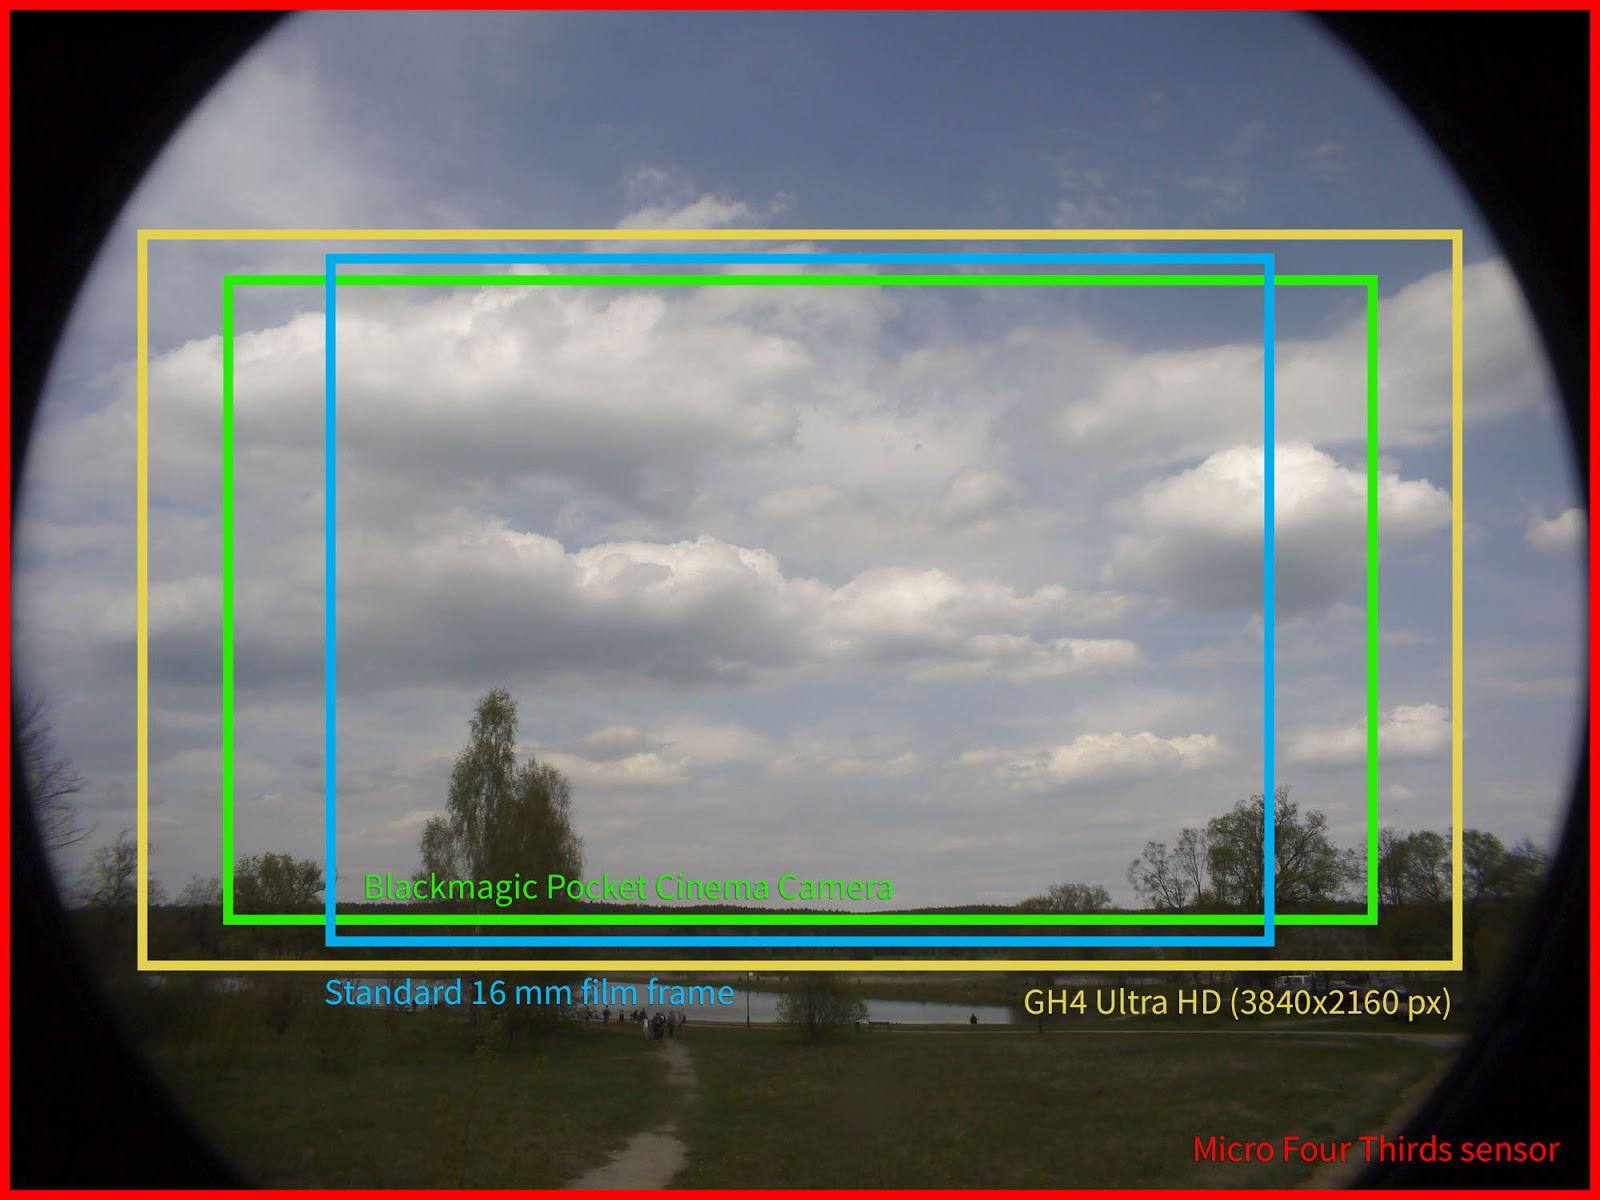 Cosmicar 12.5/1.9 @22 - MFT, BMPCC, GH4 UltraHD sensor coverage